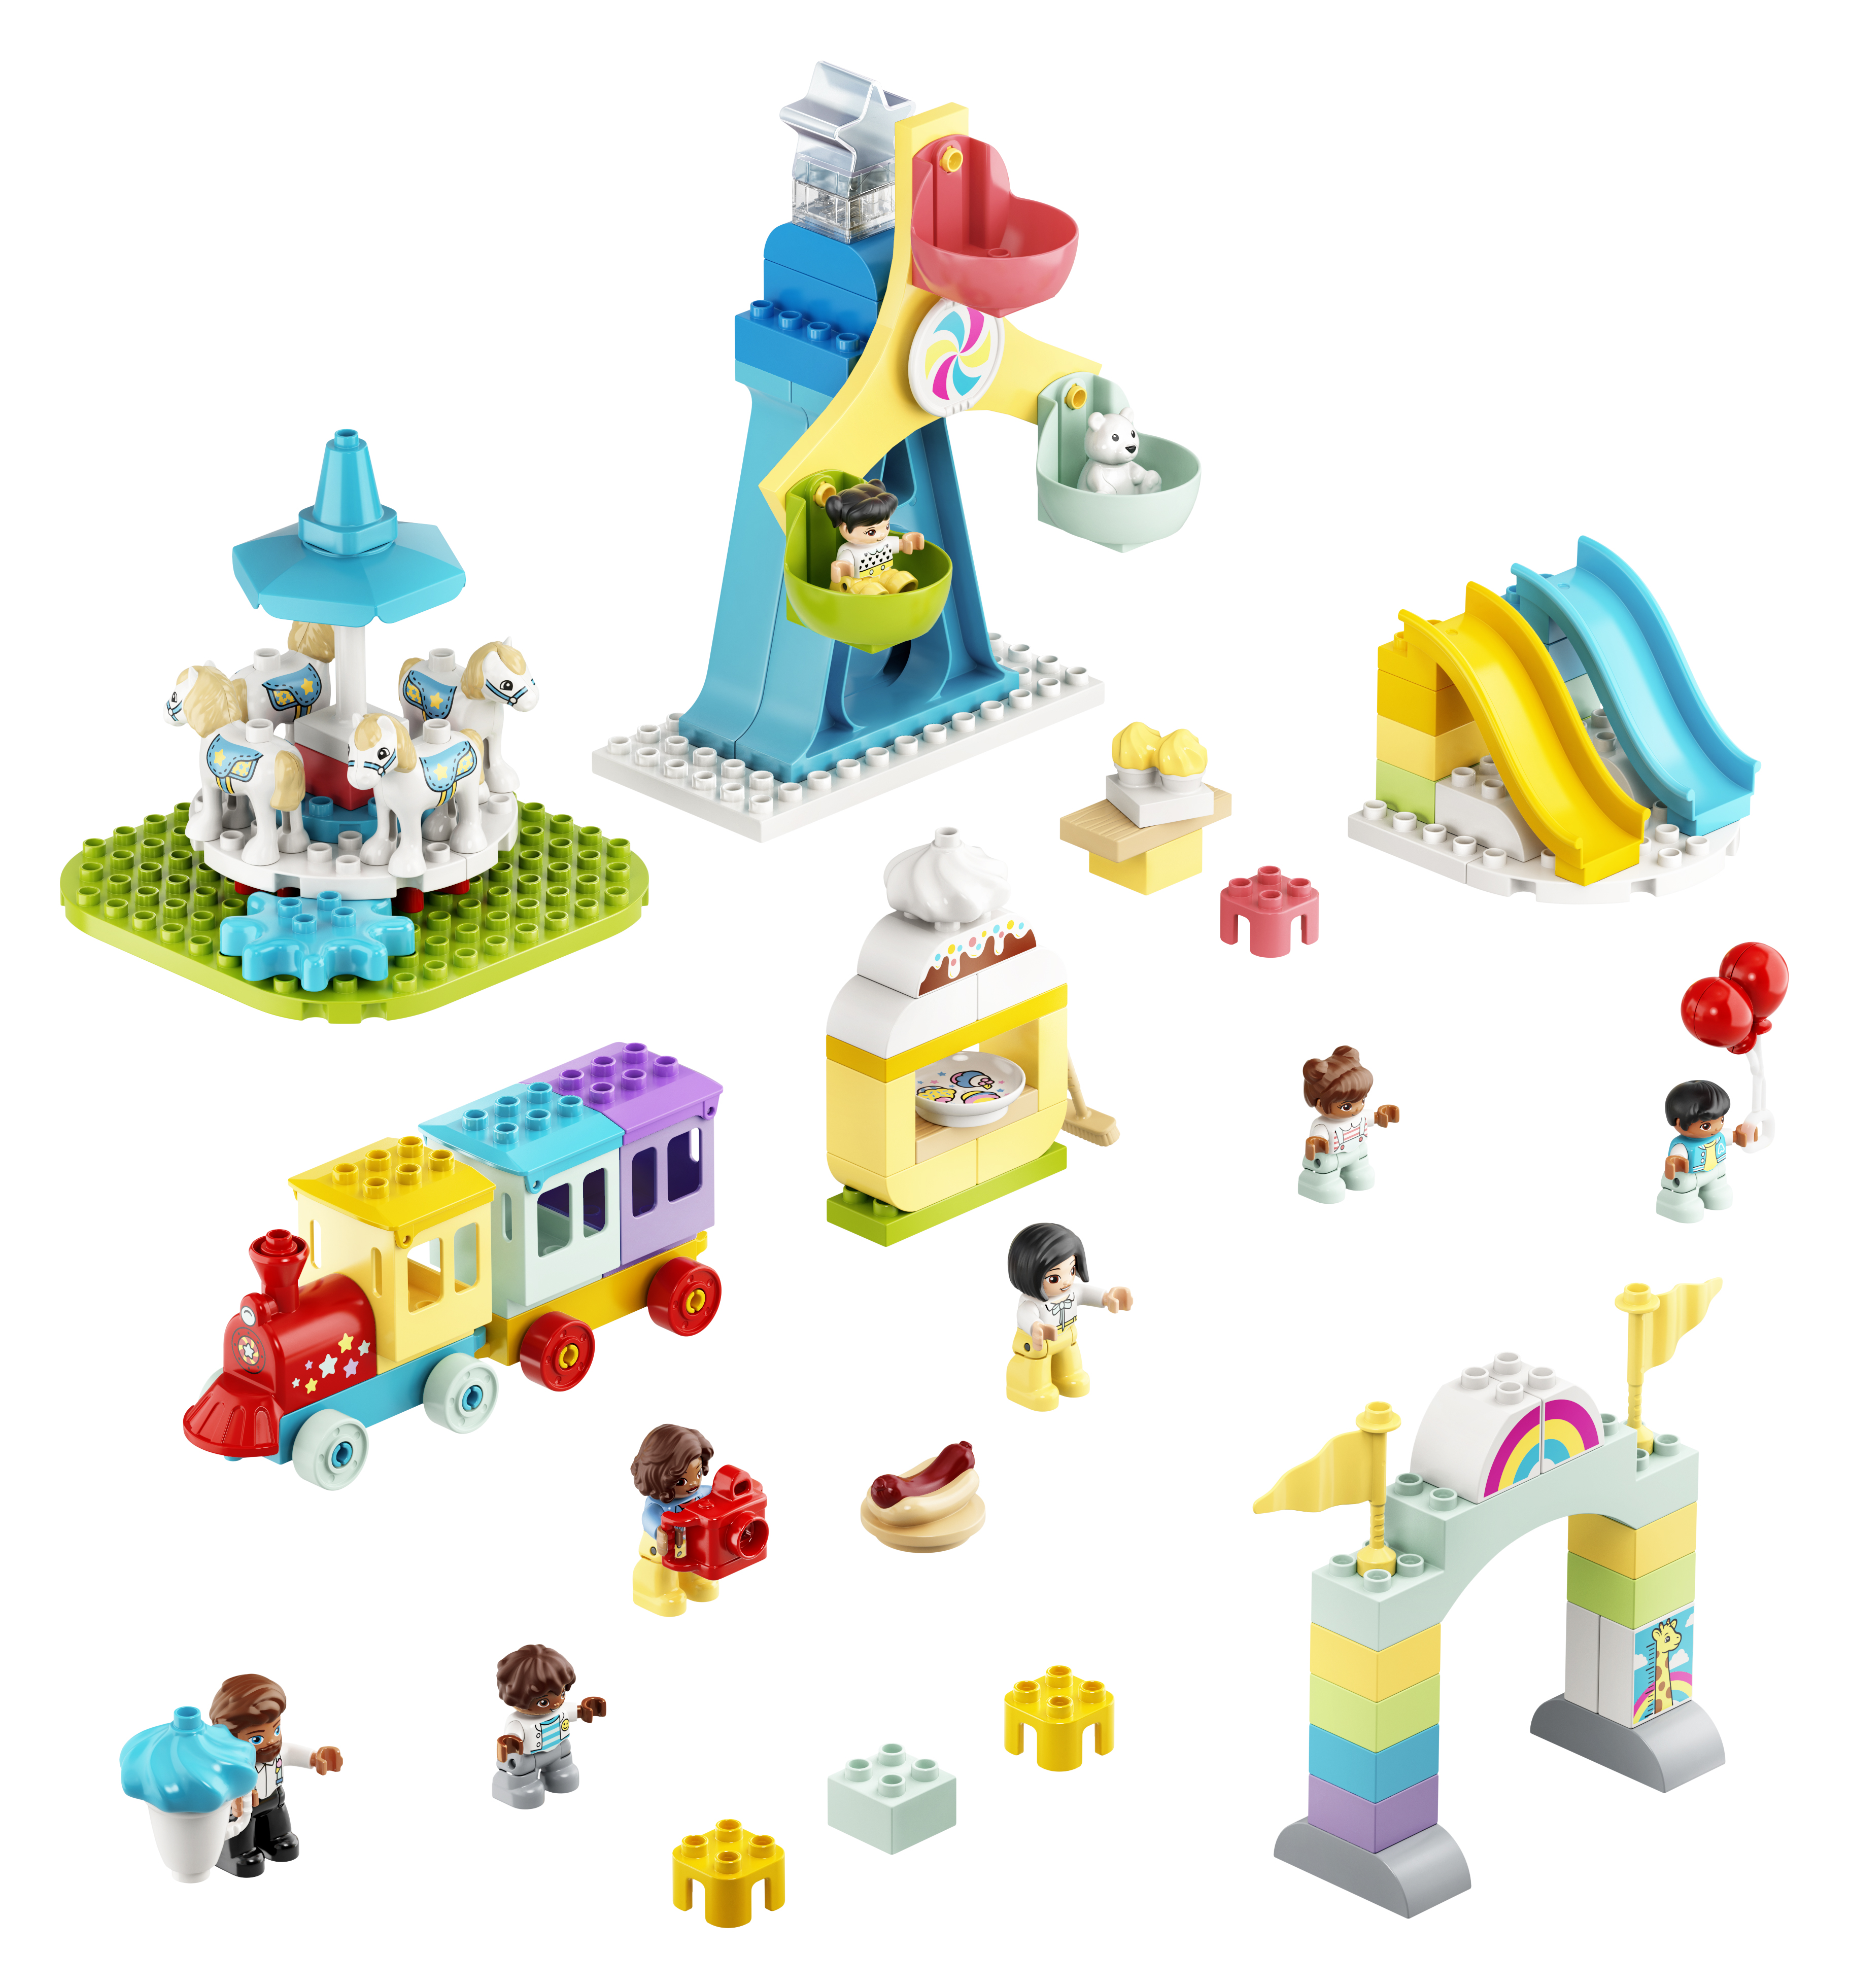 LEGO DUPLO Forlystelsespark - 10956